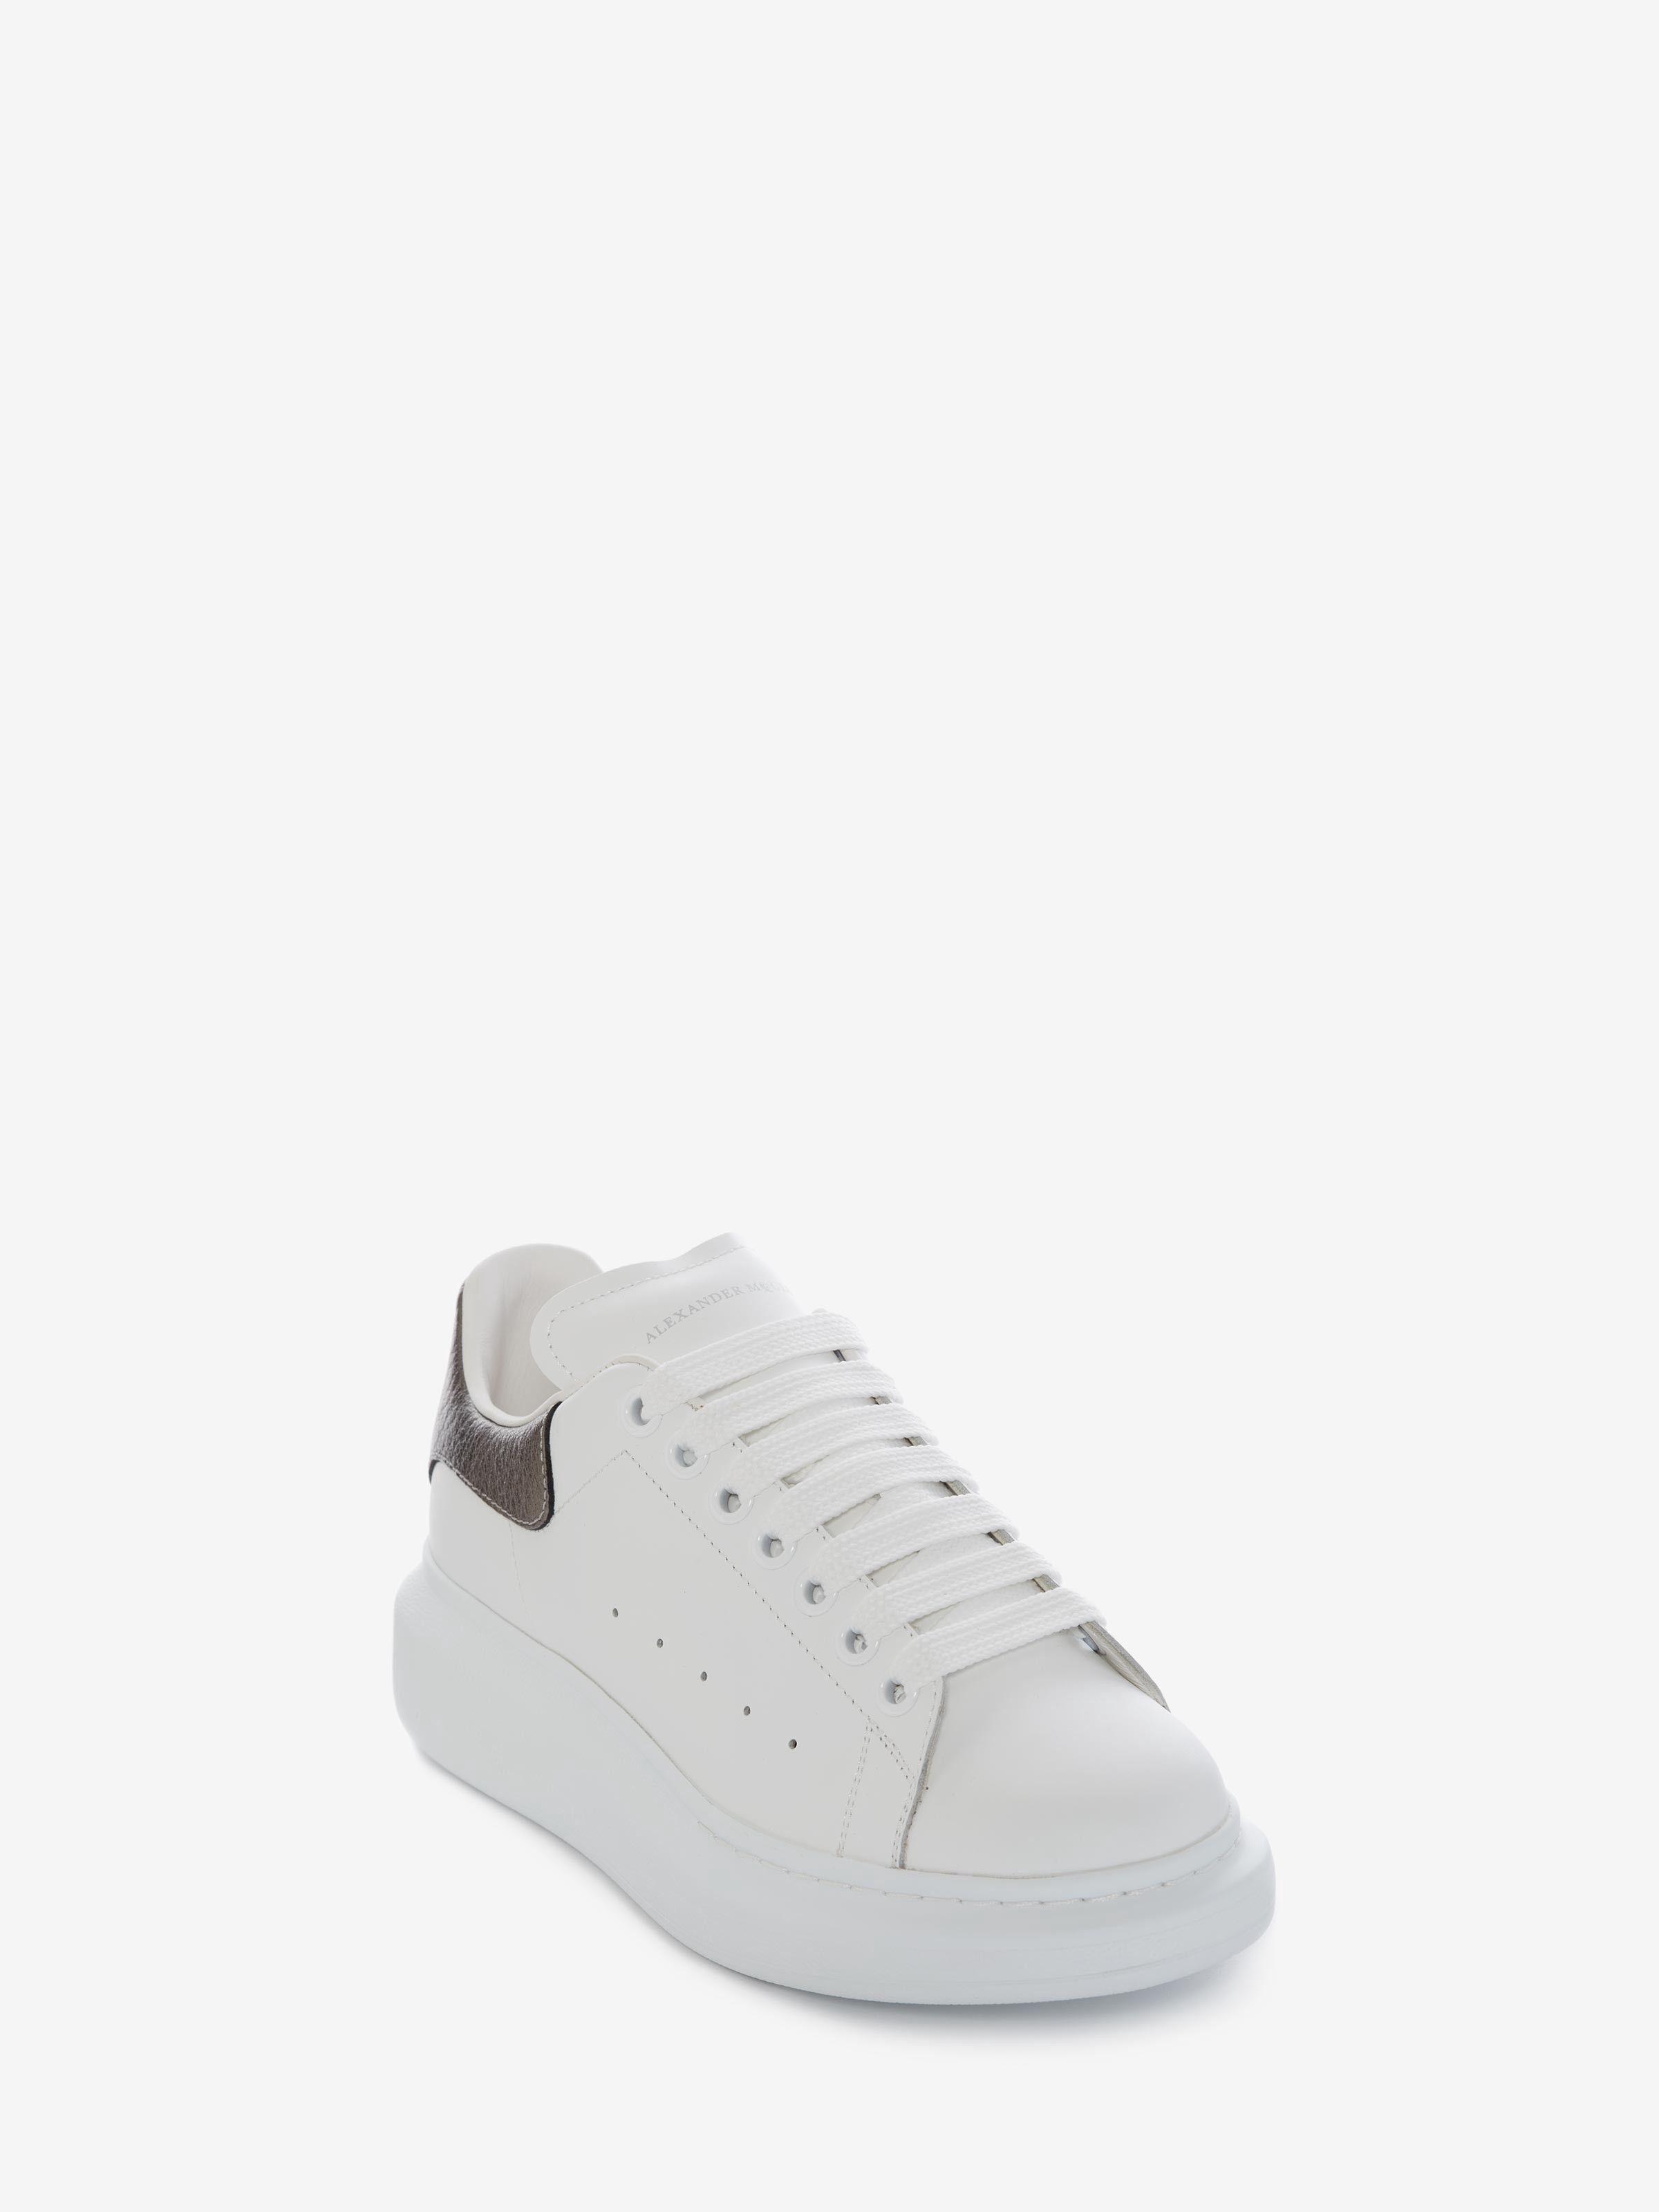 Alexander Mcqueen Oversized Sneaker Bleach White 34